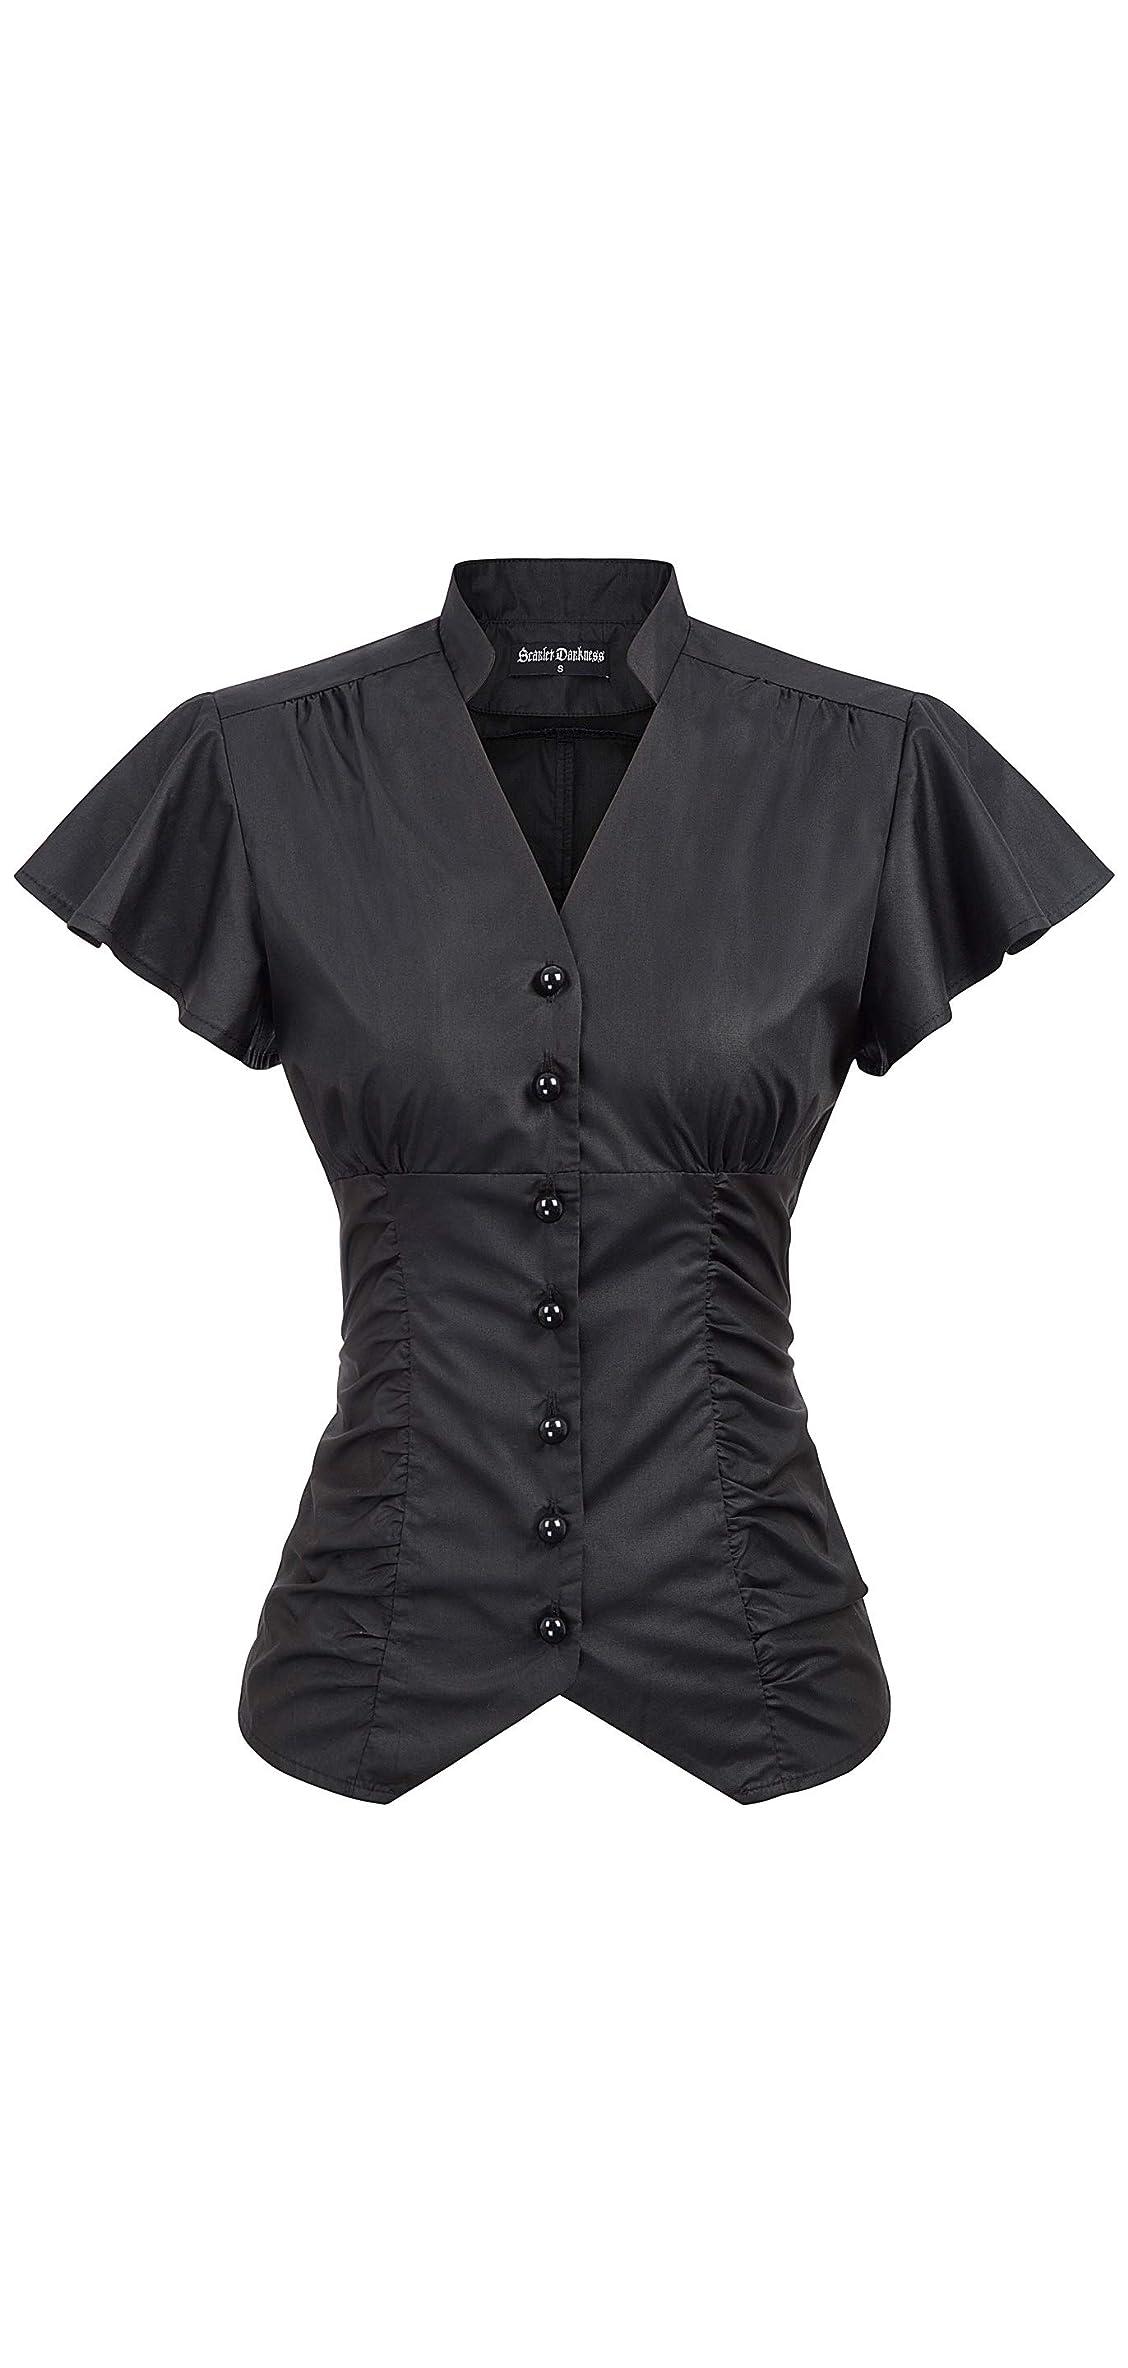 Women's Victorian Blouse Shirt Steampunk Gothic Victorian Tops